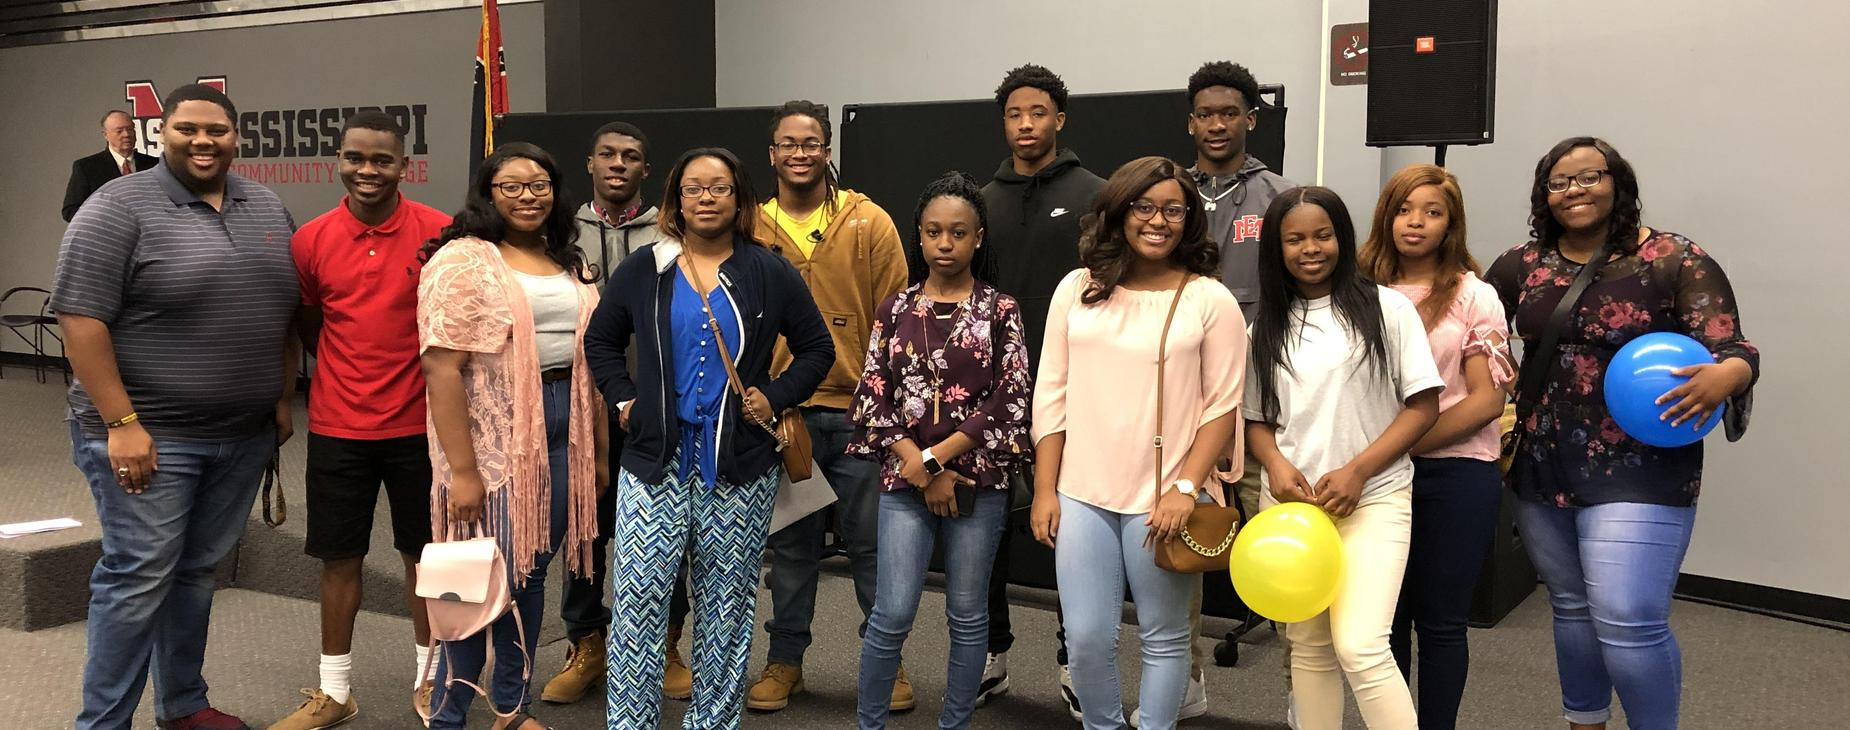 Seniors 2019